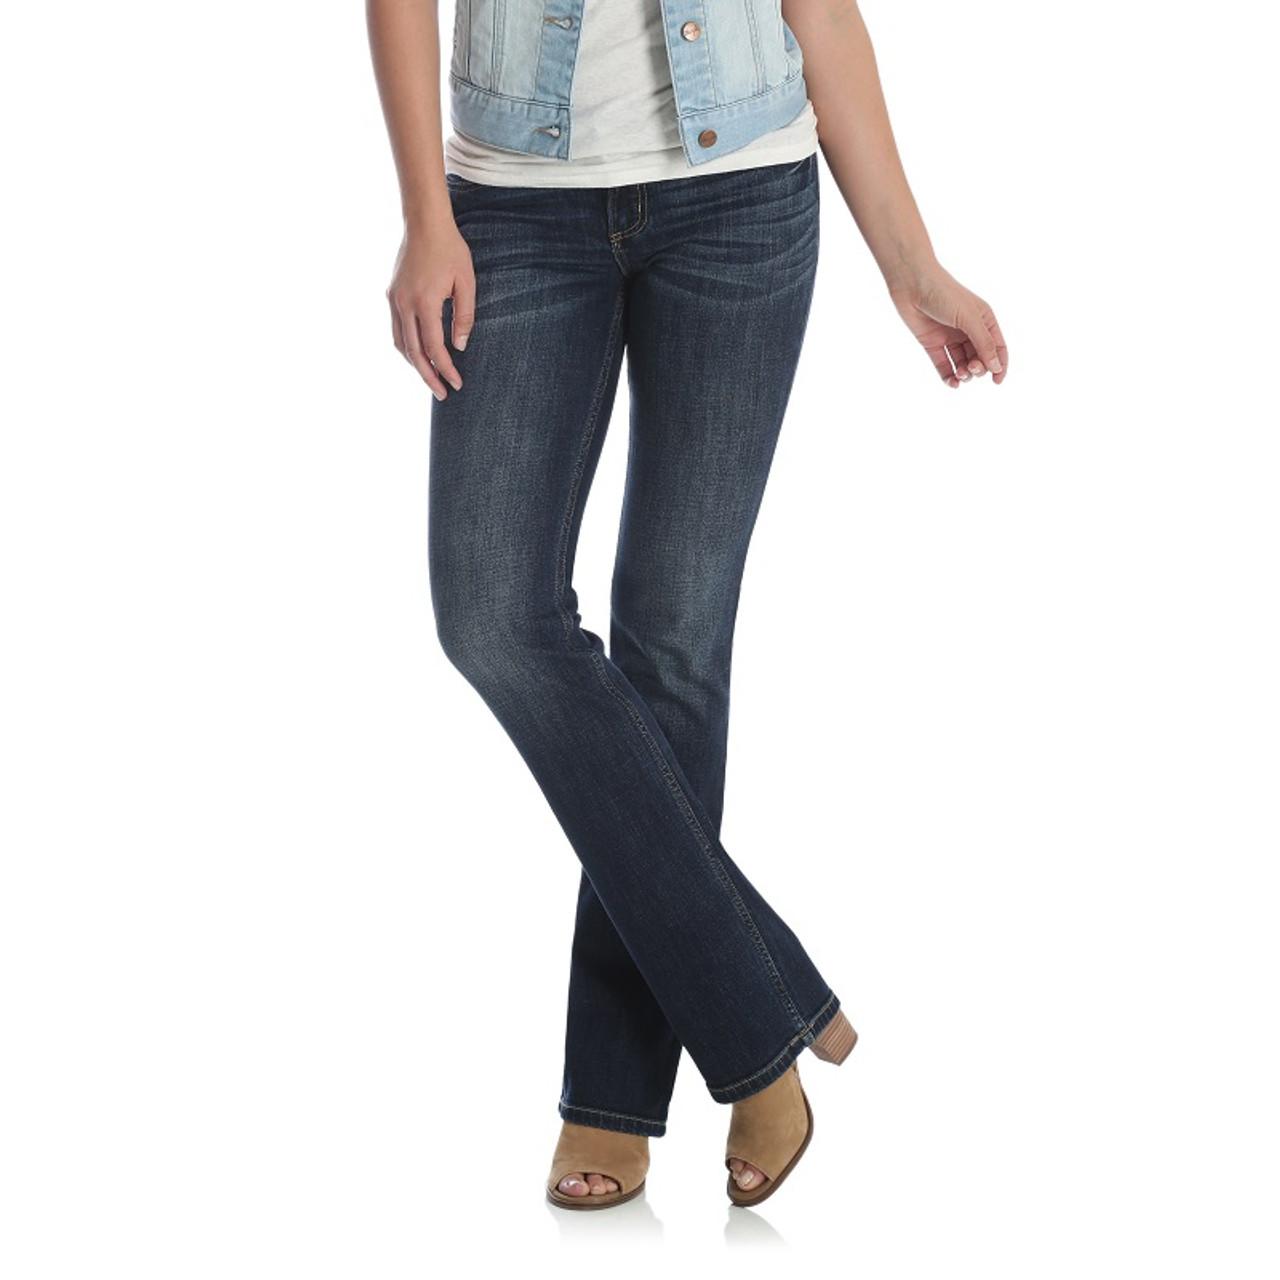 78779fcd Wrangler Women's Retro® Sadie Low Rise Jeans. Wrangler